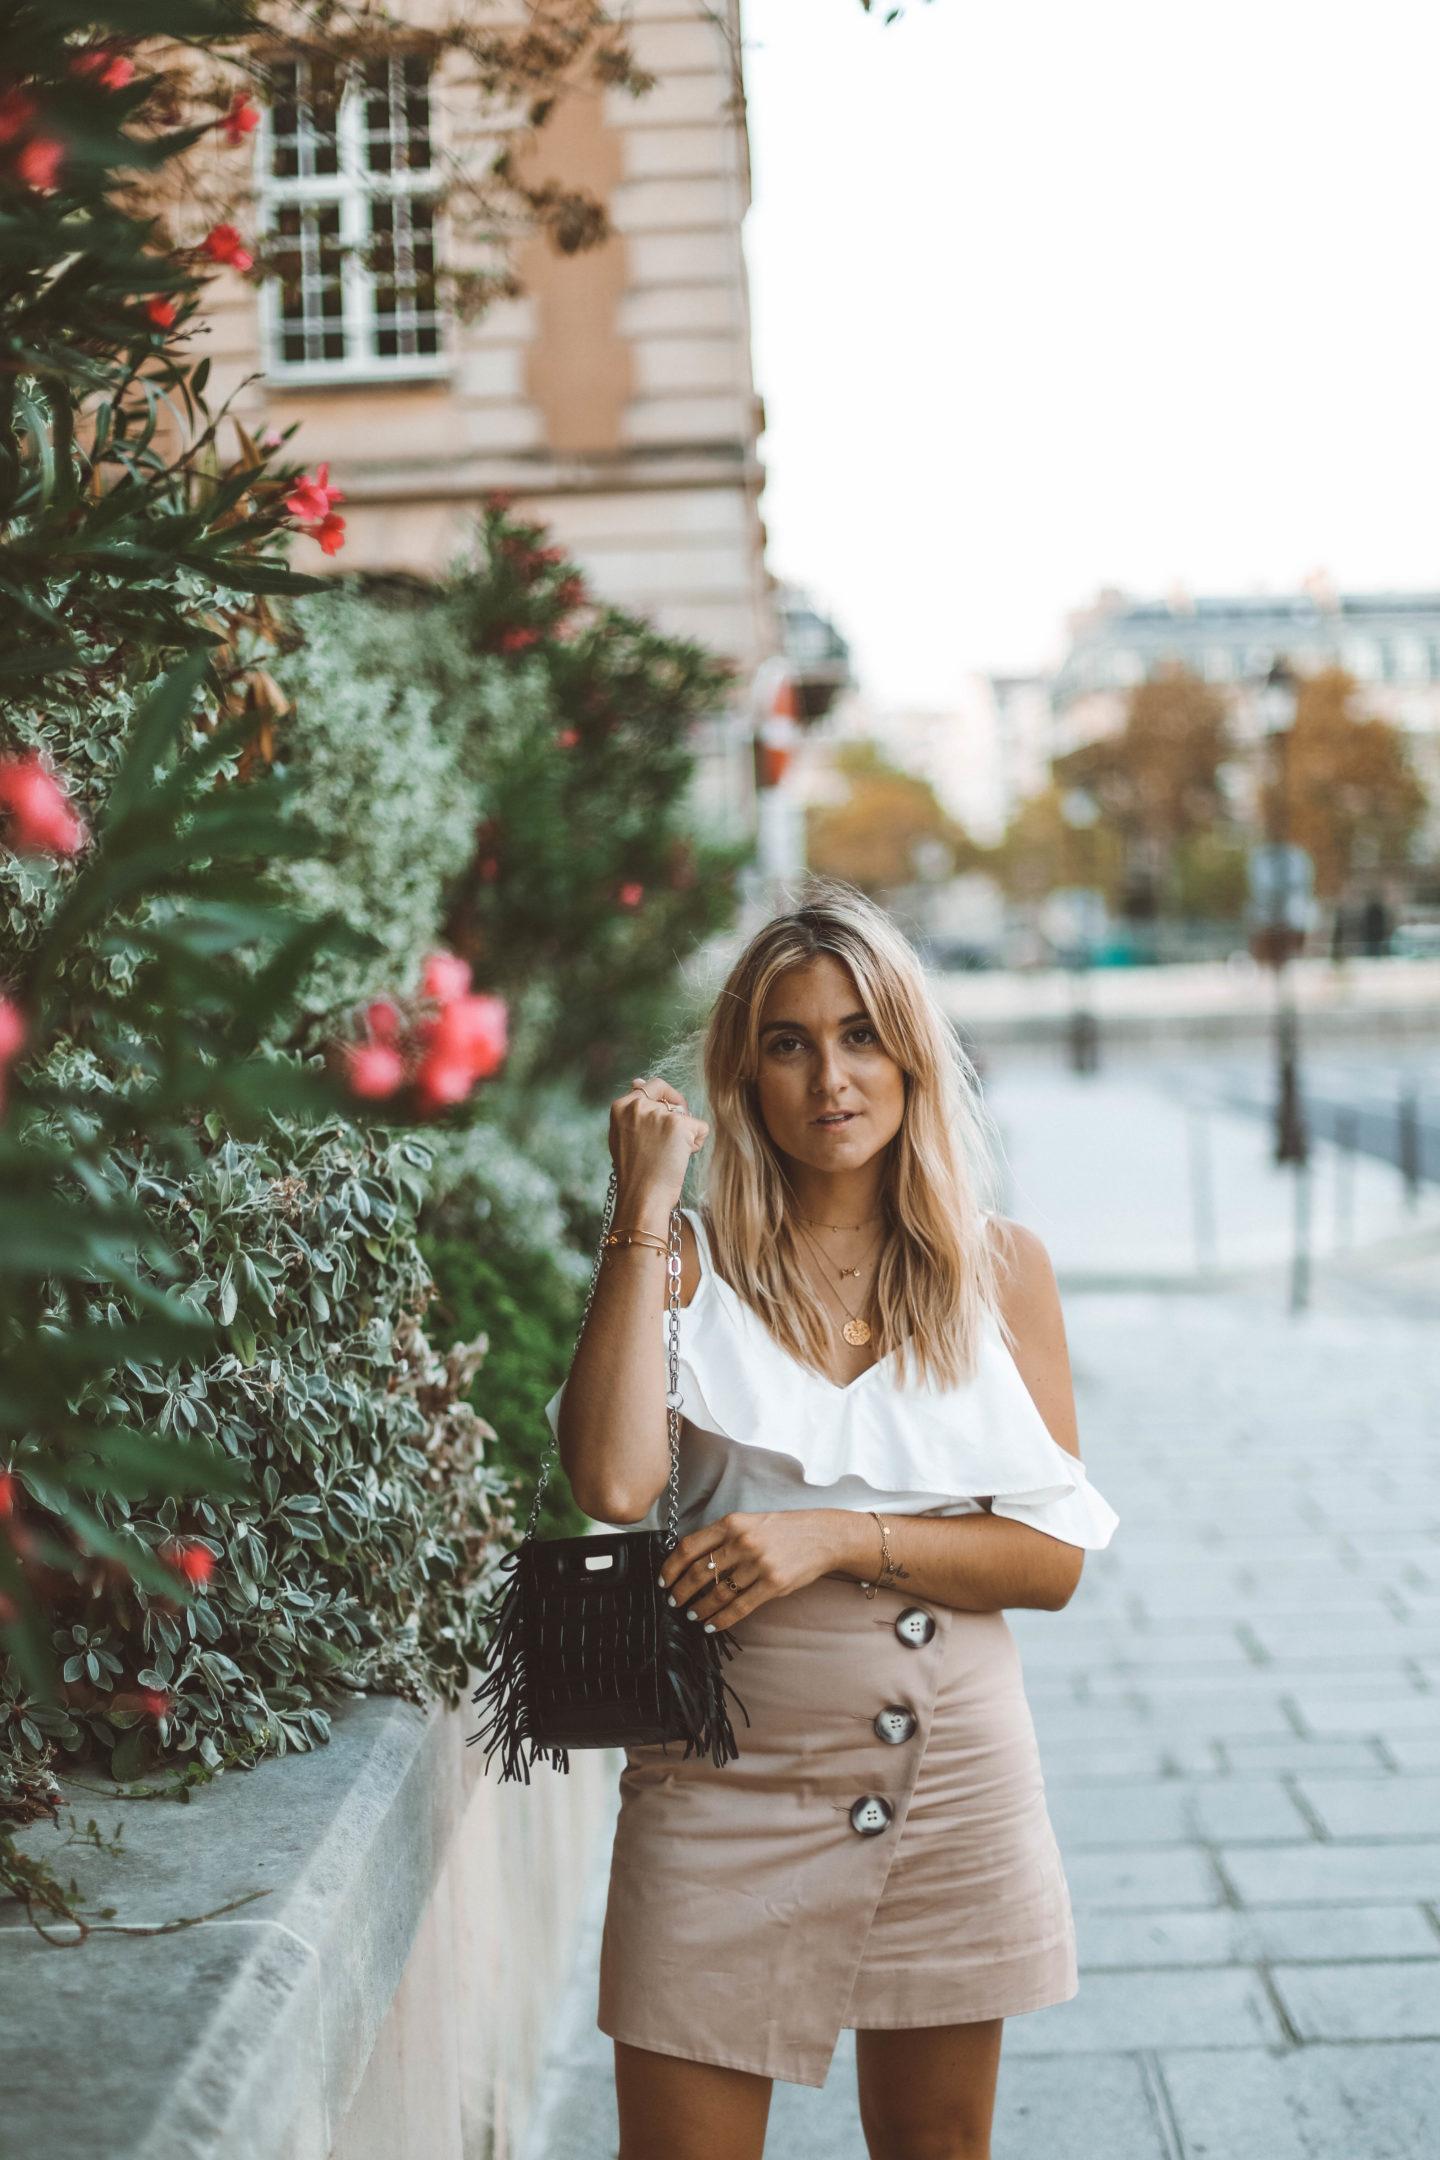 Vernis OPI - Blondie baby blog mode Paris et voyages